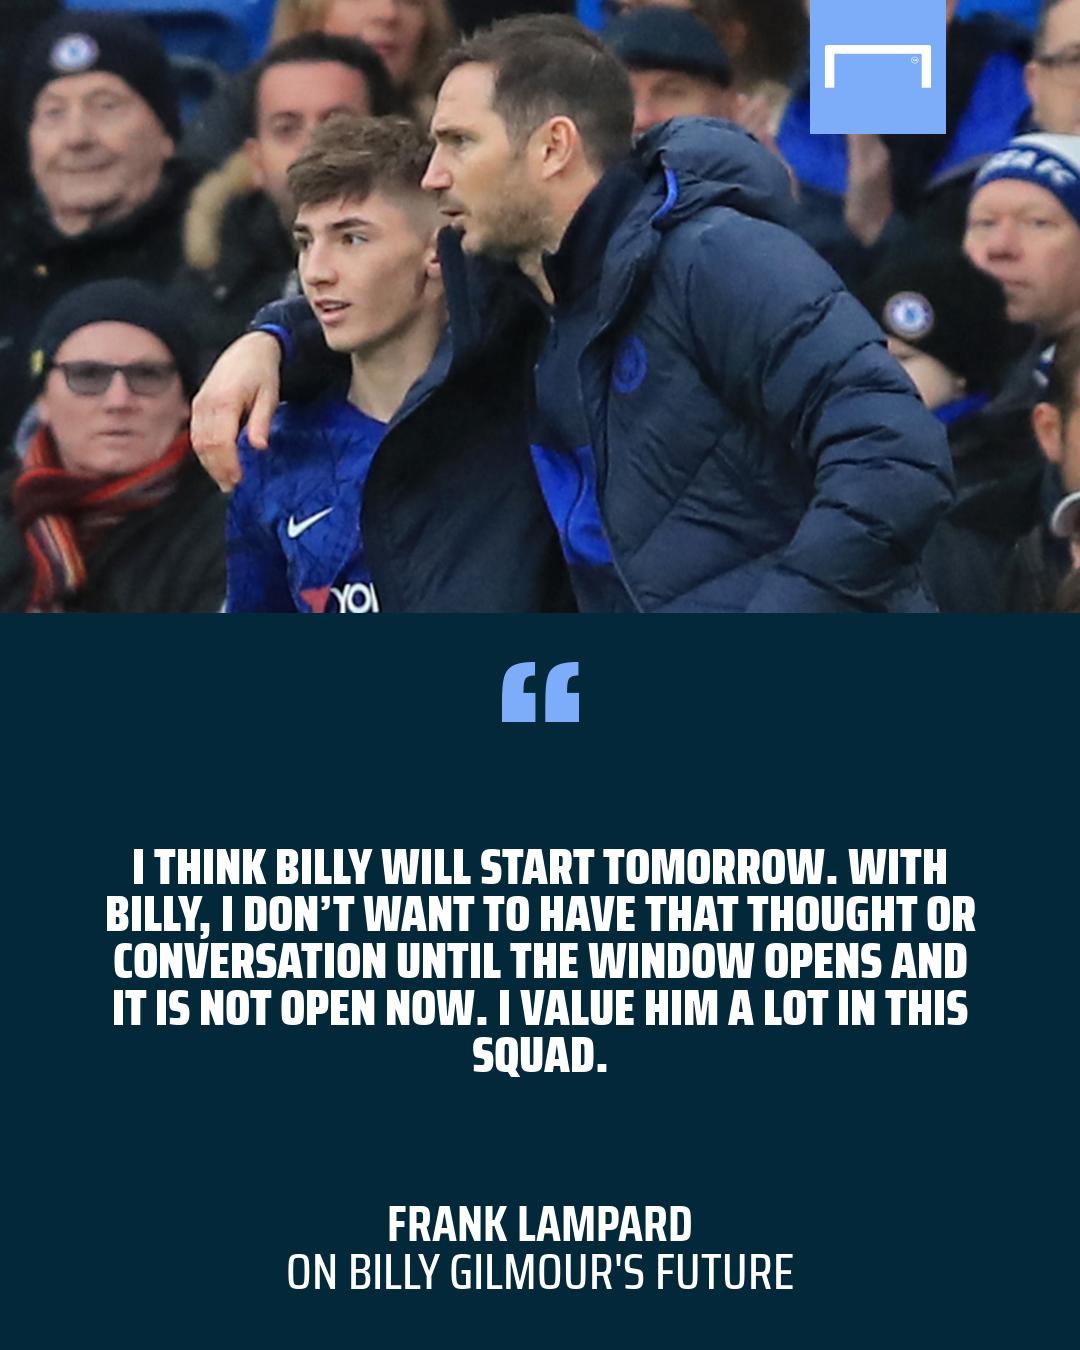 Lampard praises Kepa and will start him against Krasnodar